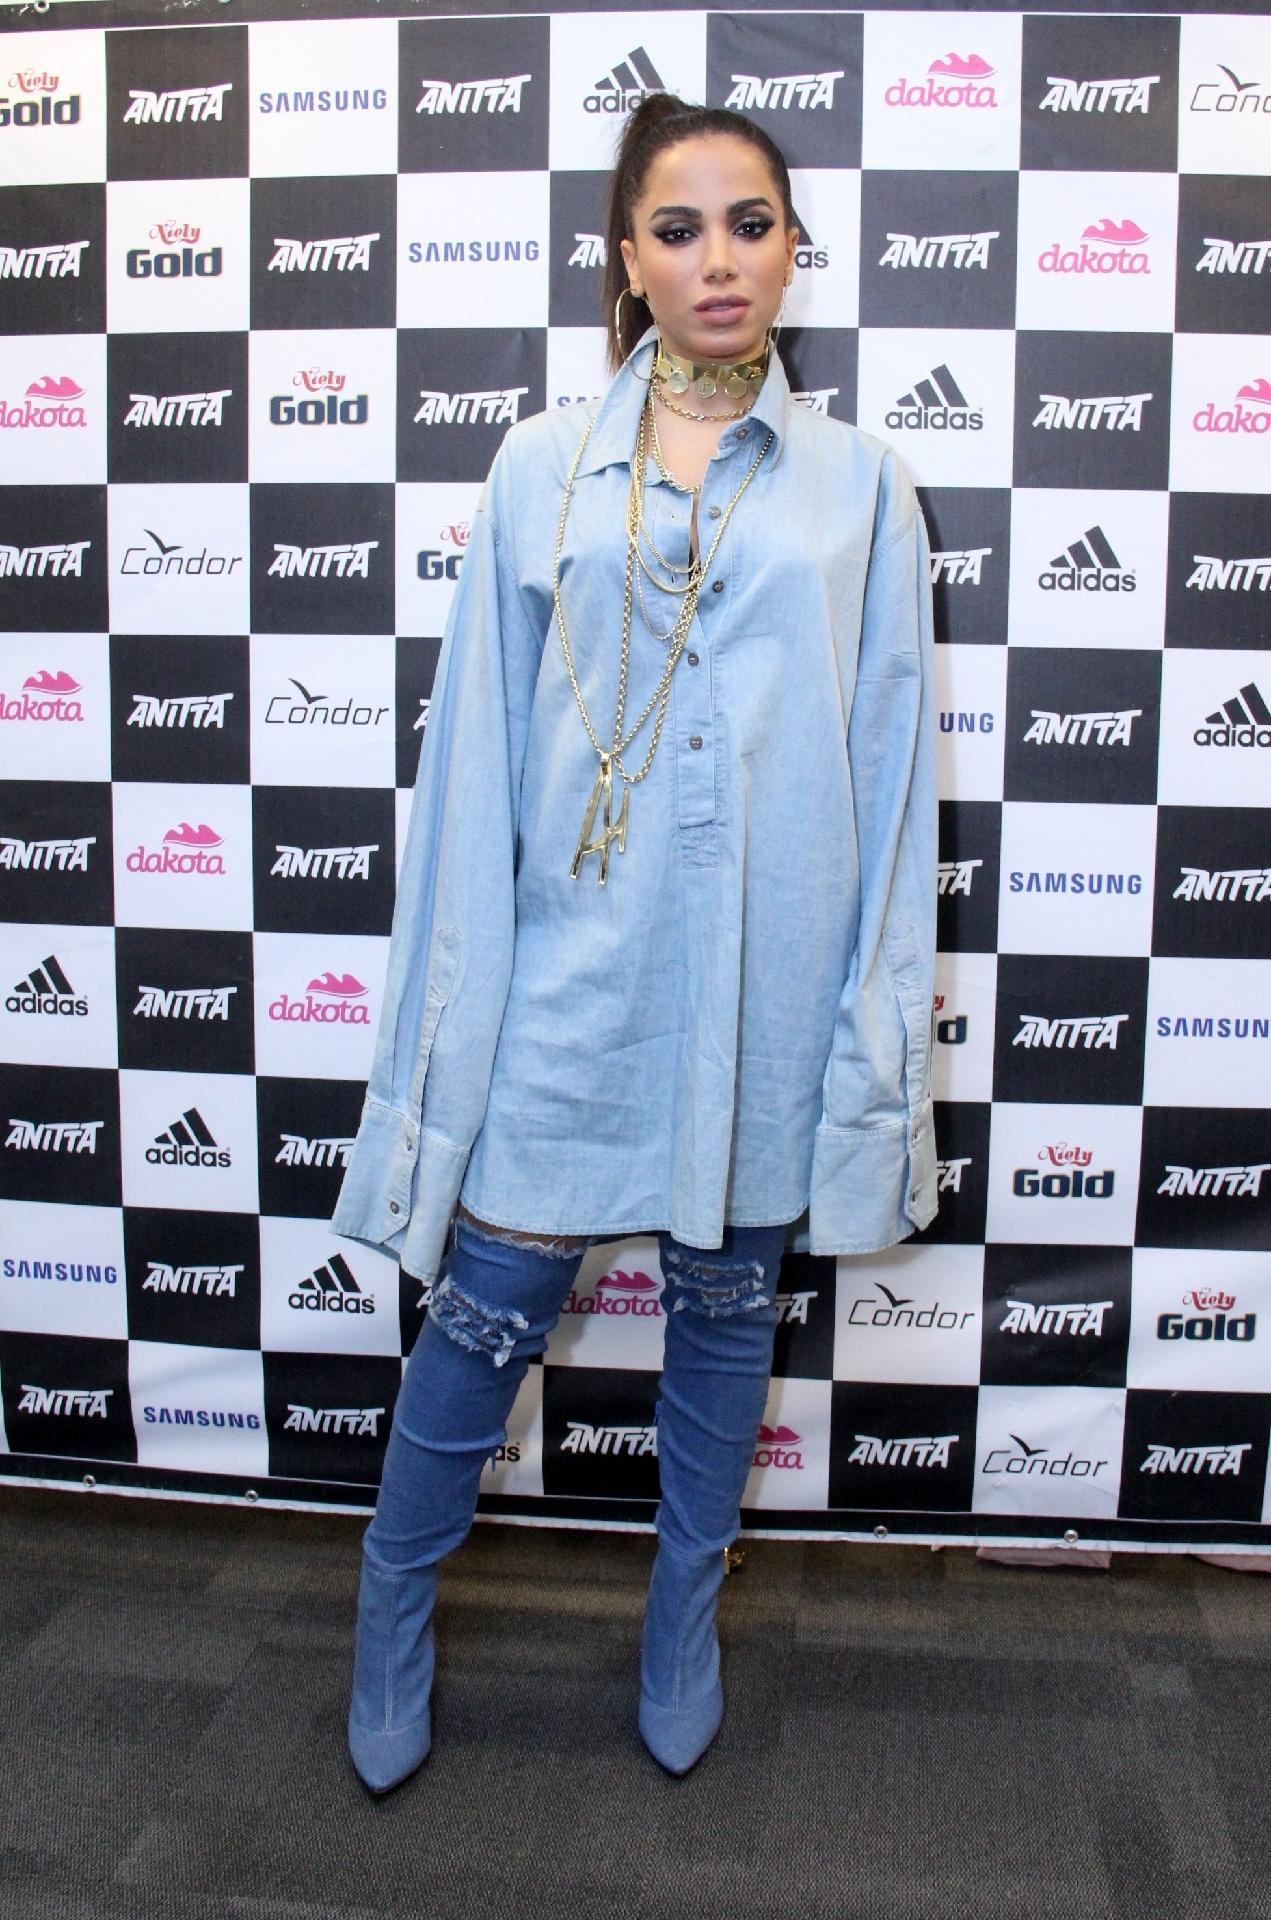 ba99262aa Copie o Look: Anitta ousa no total jeans, inspire-se no visual da cantora -  17/08/2017 - UOL Universa